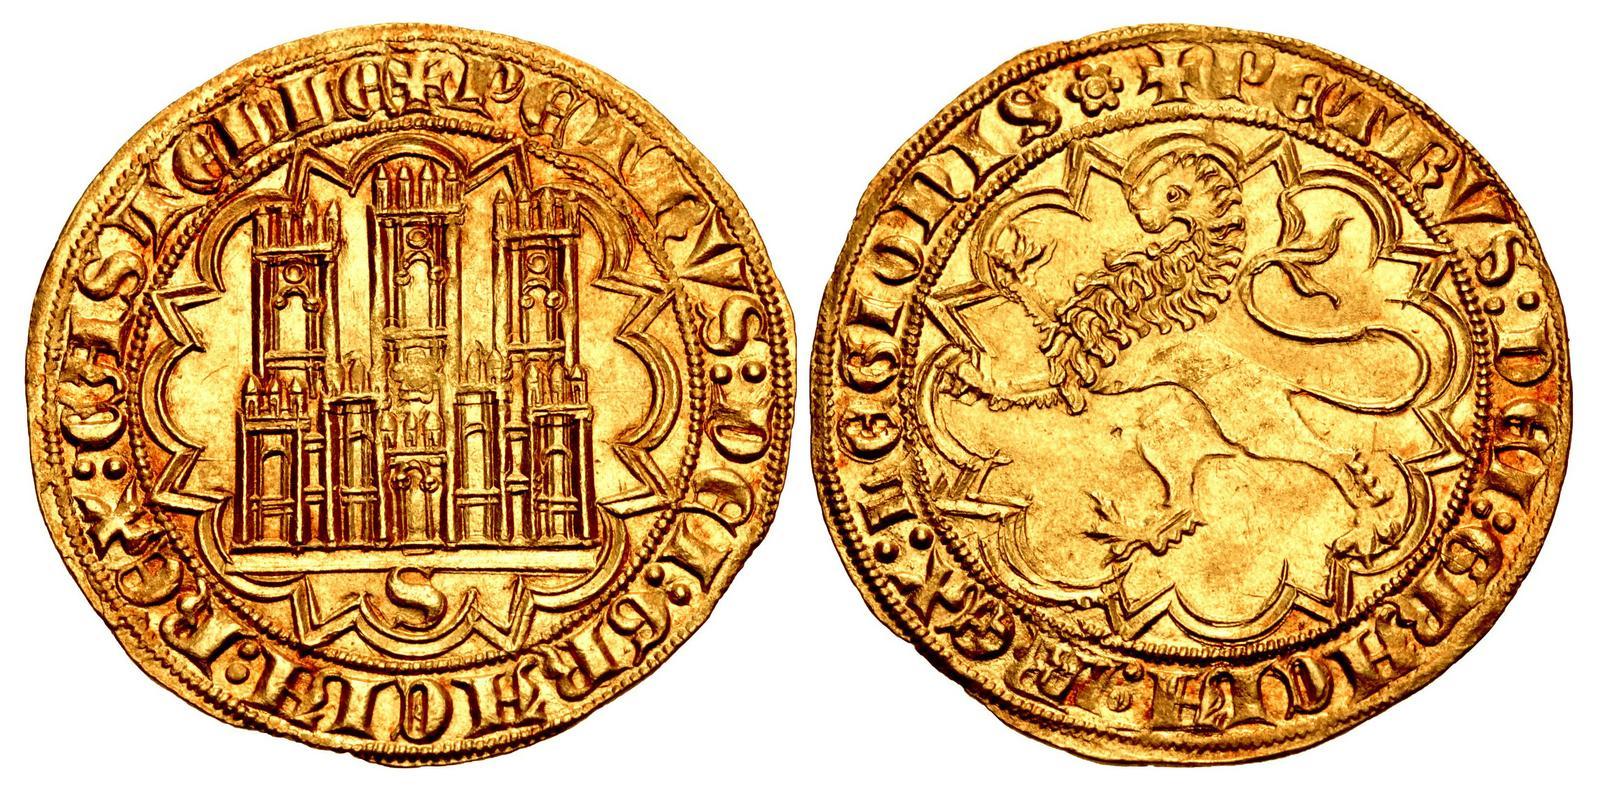 Iconic Dolba of Pedro I